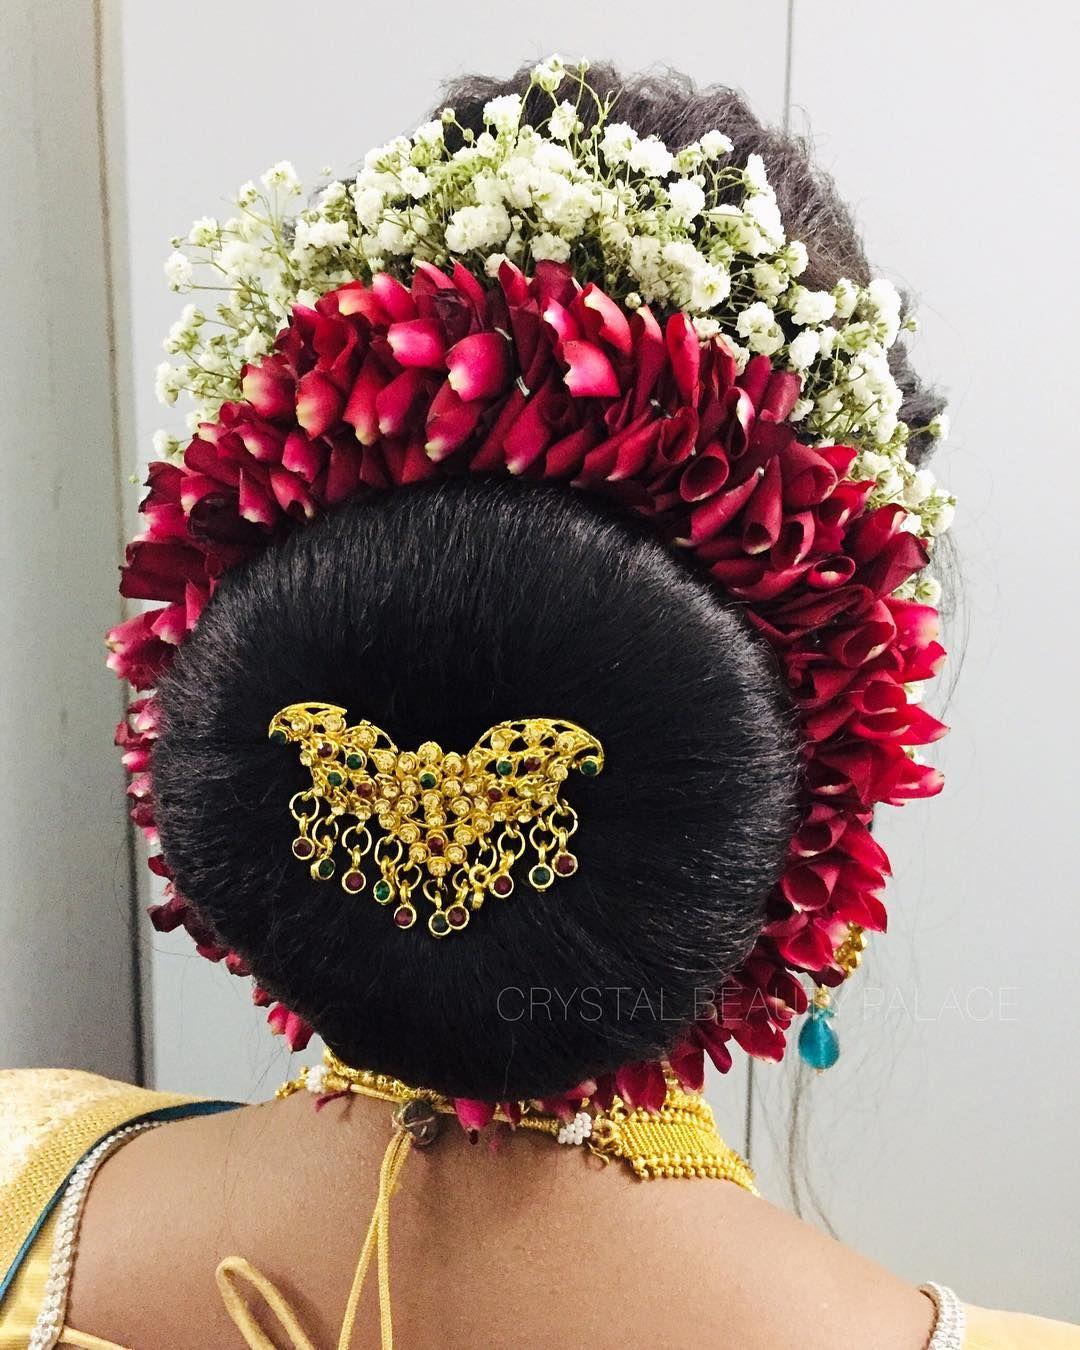 Timeless Elegant Bun Created With Rose Petals And Baby S Breath Bun Elegantbun Updo Hairstyles Rosepetals B Elegant Bun Bridal Hair Buns Rose Petals